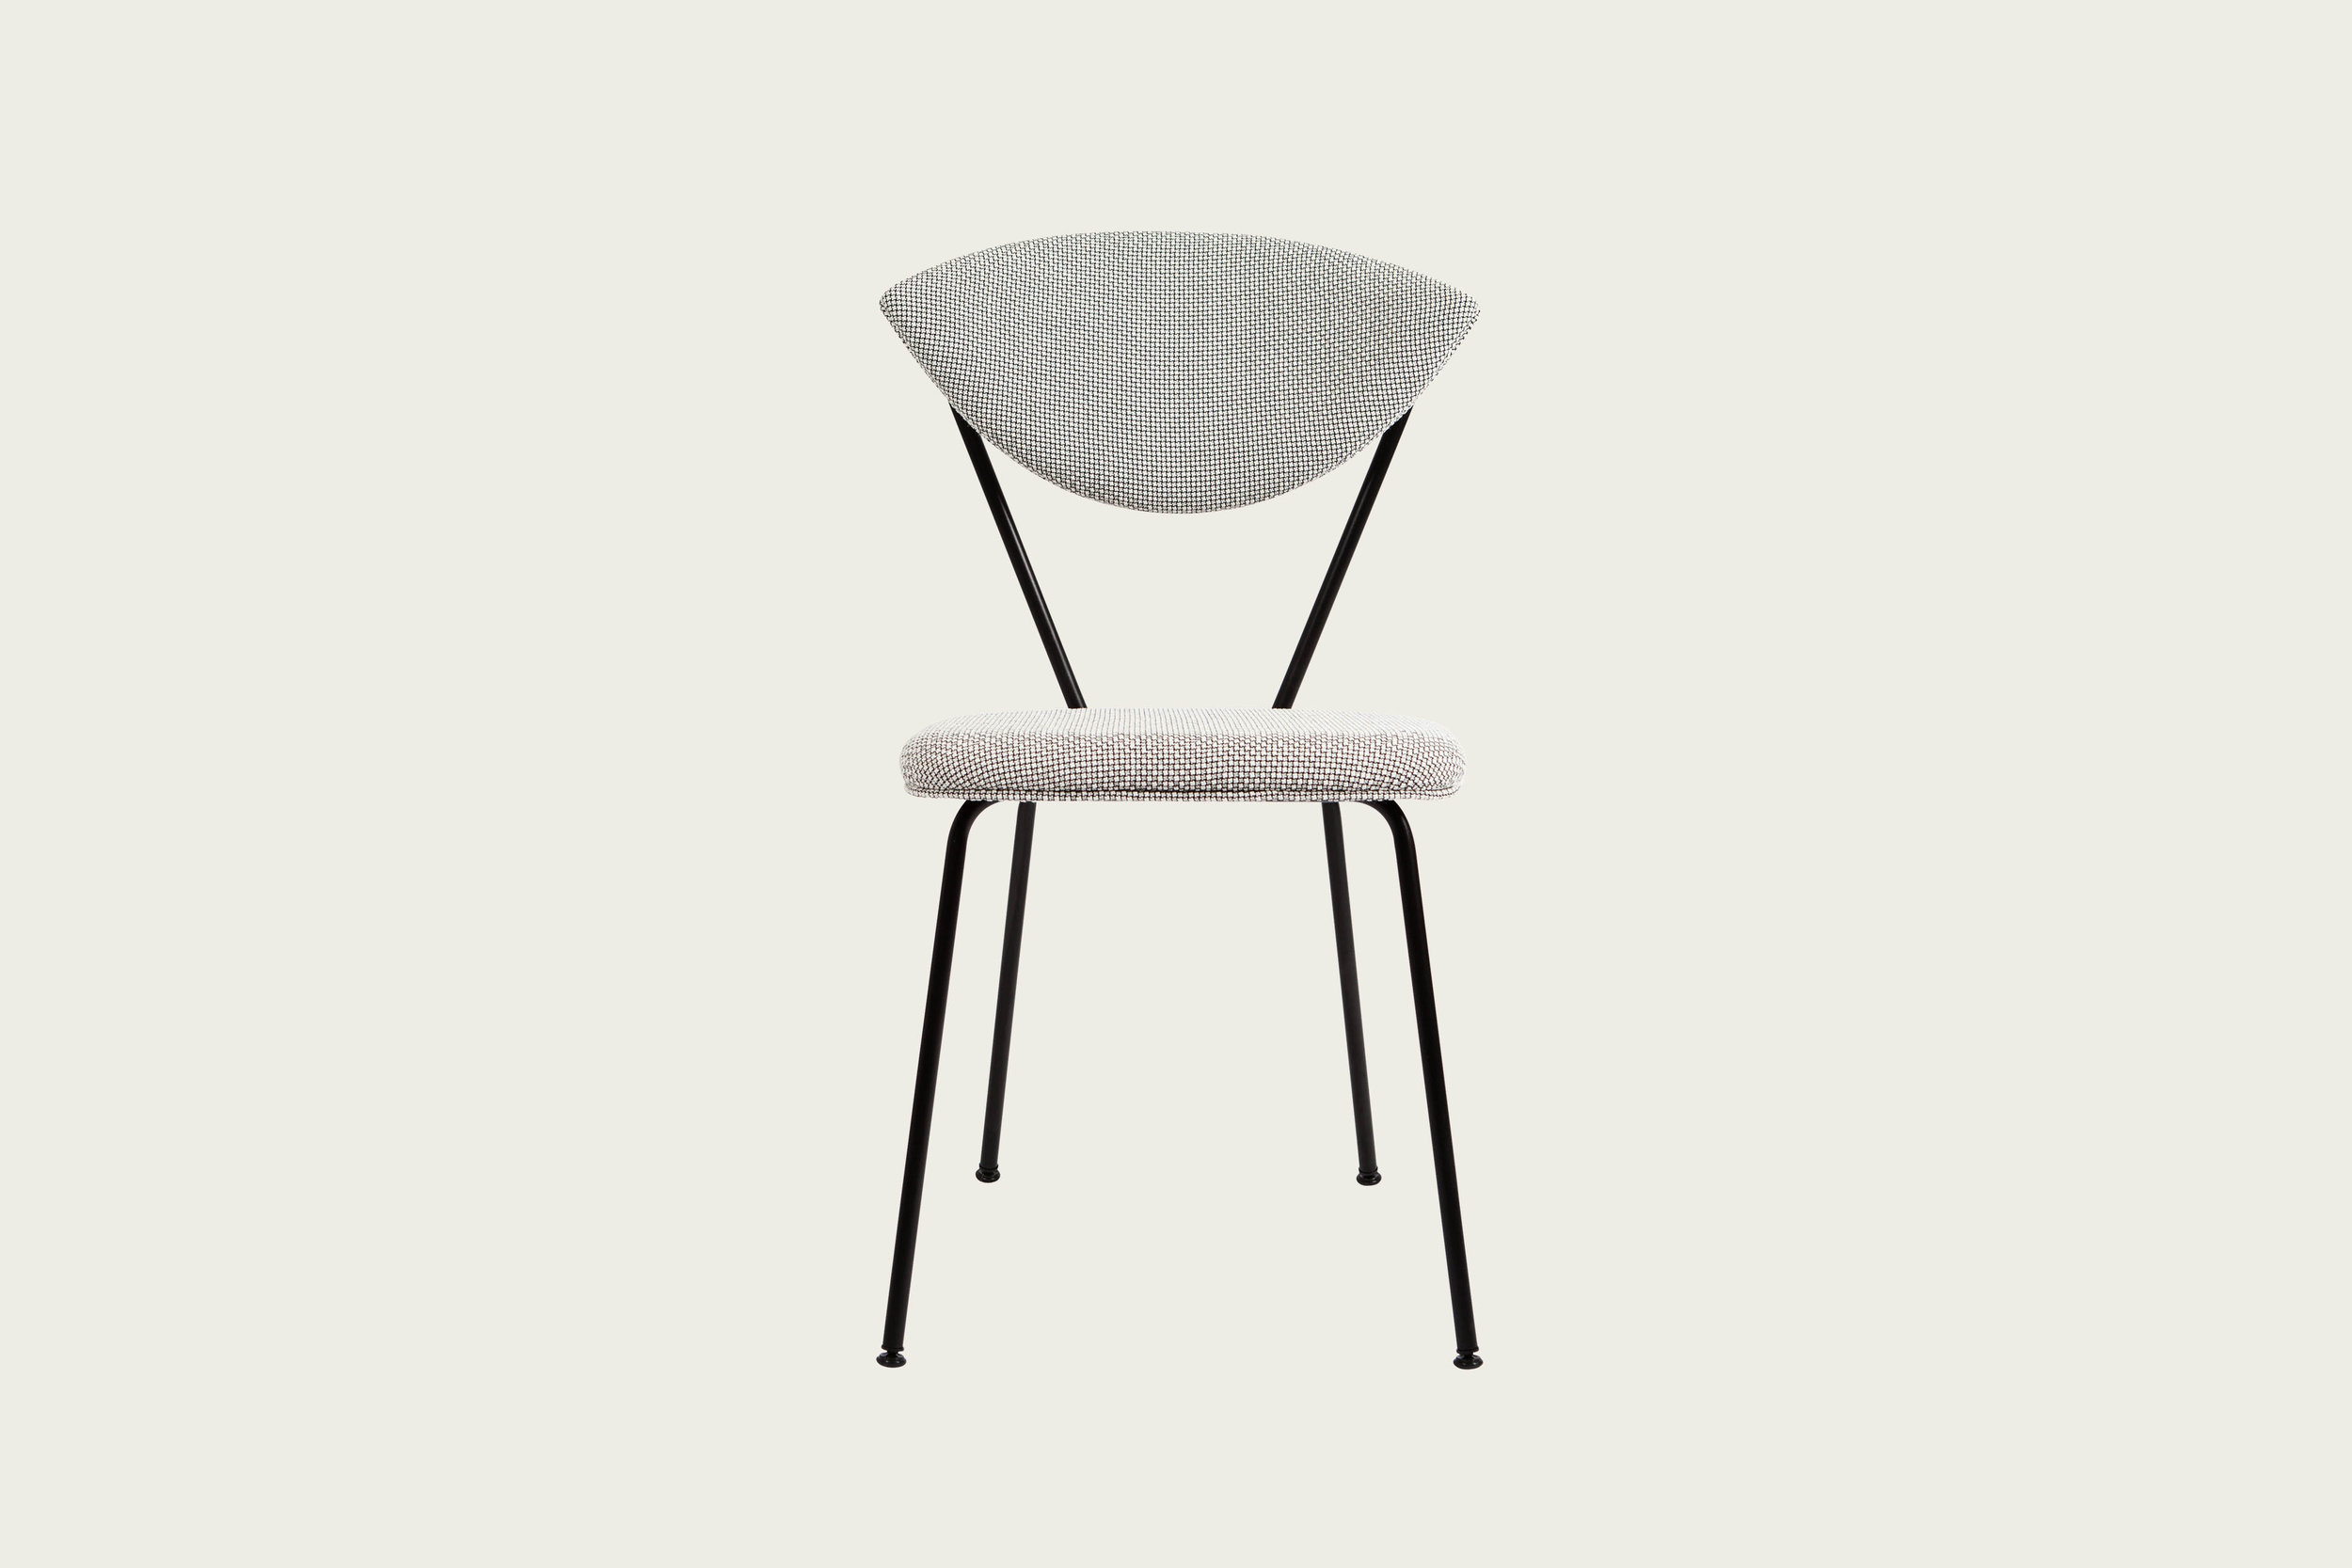 201213_1_AVENUE dining chair_fab3_fab3_highres (2) kopier.jpg